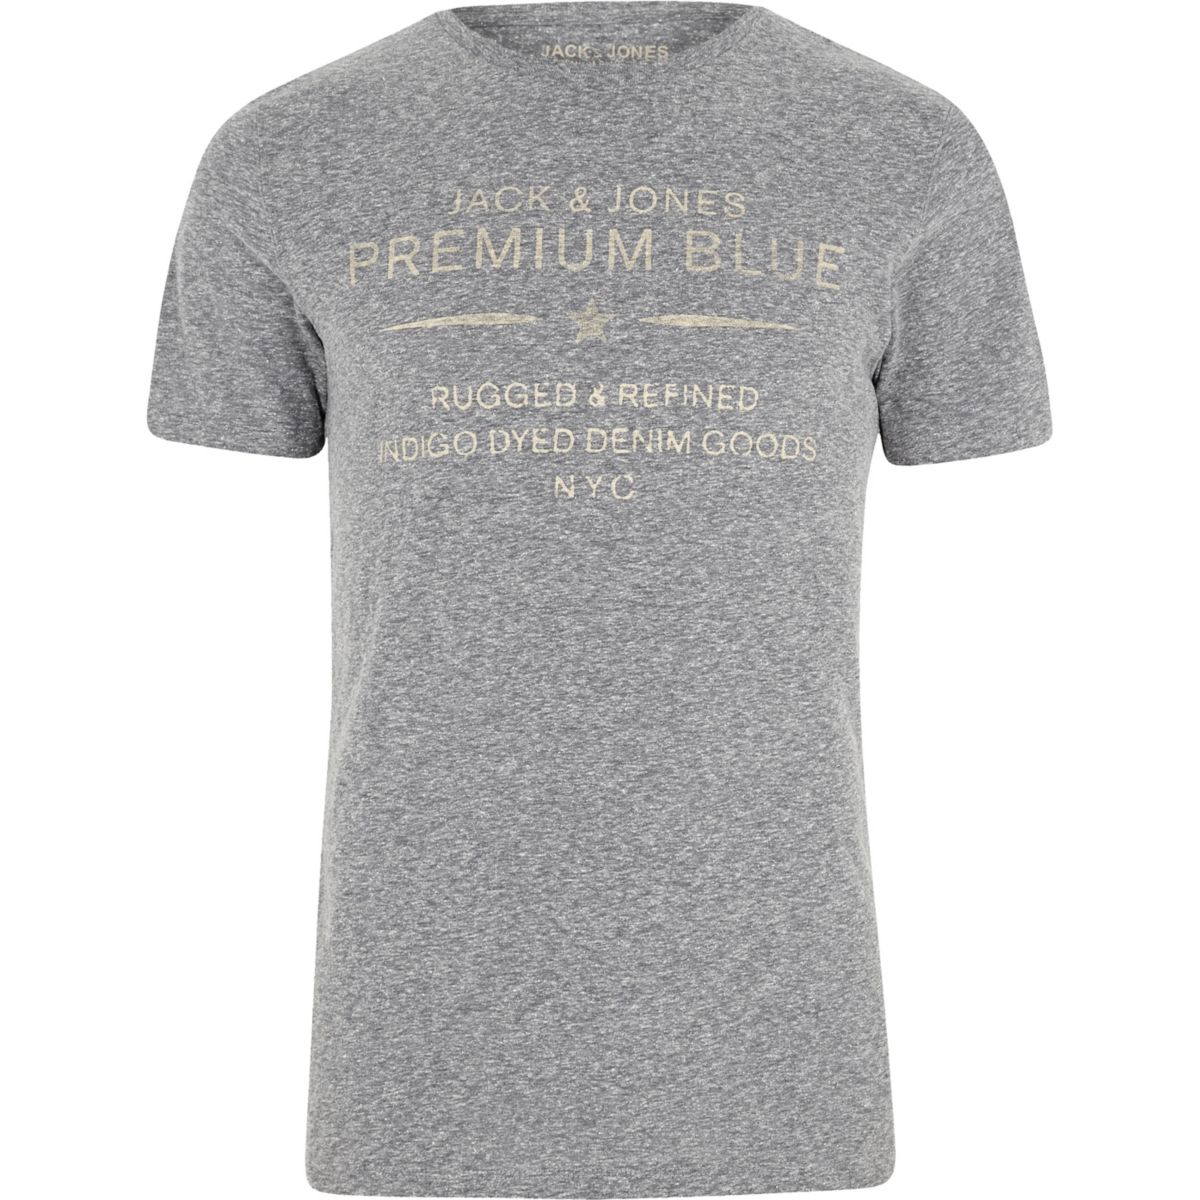 Jack & Jones grey 'premium blue' T-shirt